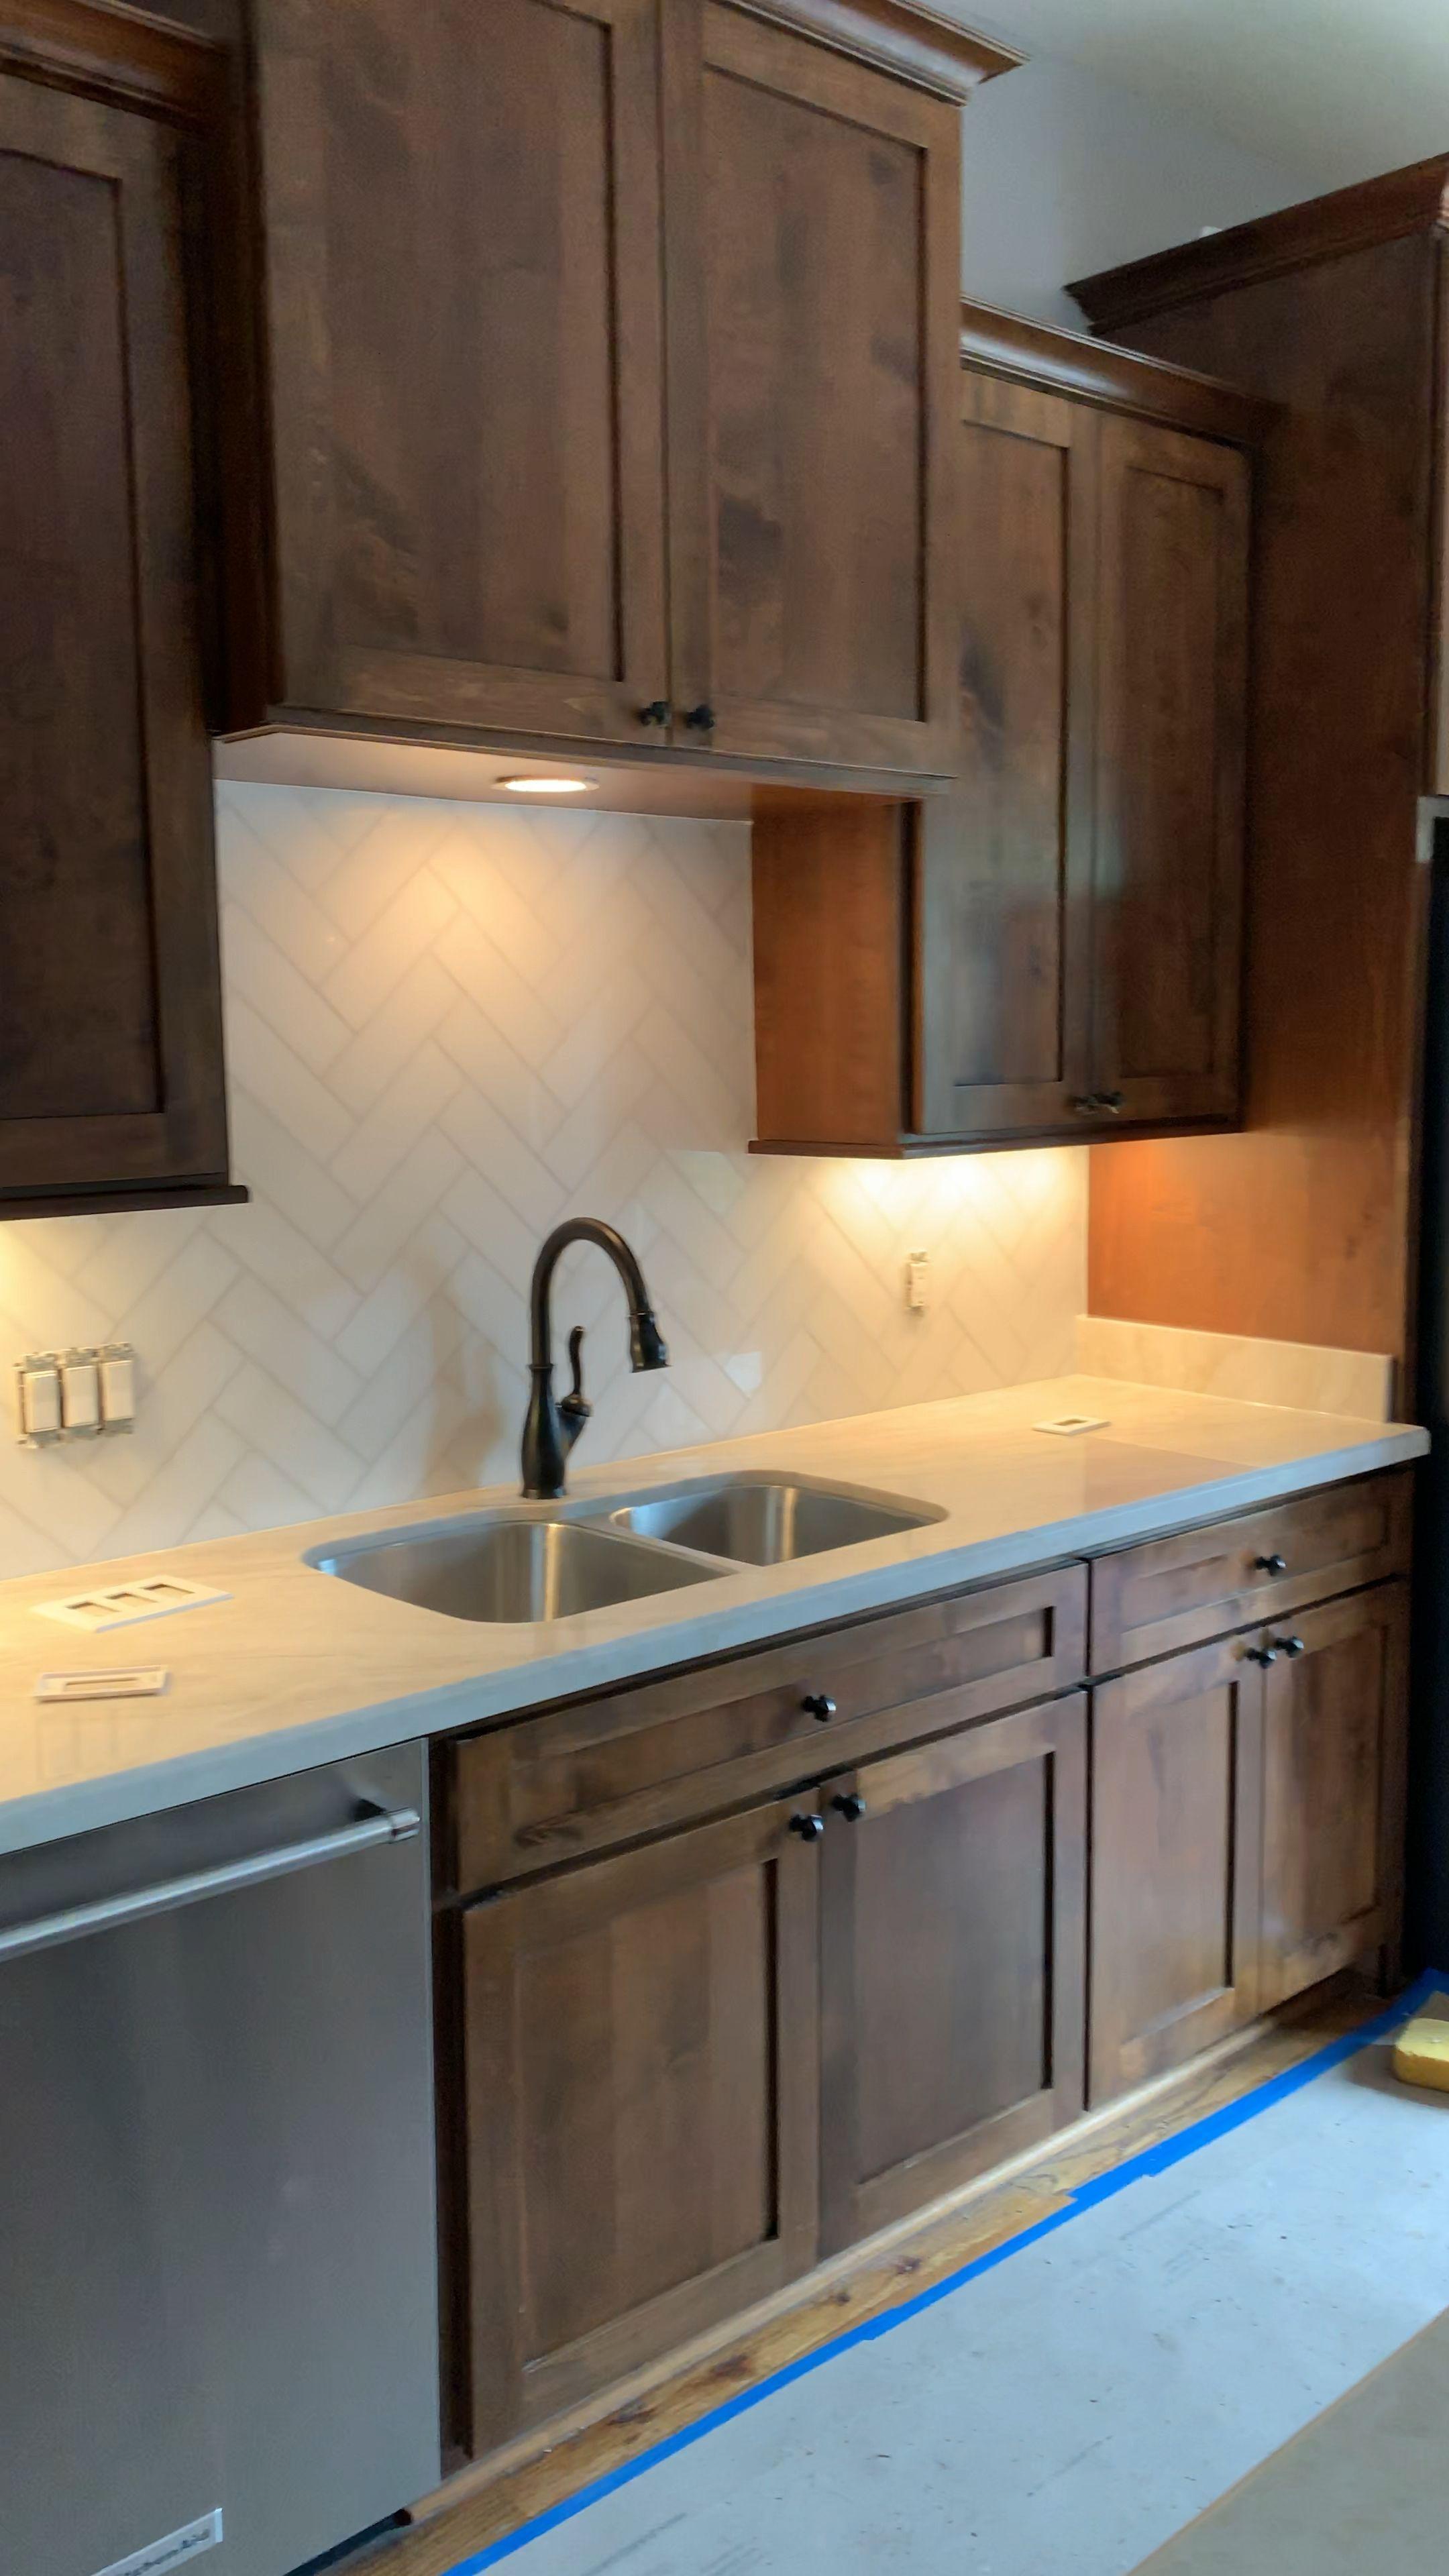 Home Decor Items Herringbone Kitchendesign Backsplash Whitemarble Kitchenideas In 2020 Rustic Kitchen Rustic Kitchen Backsplash Kitchen Design Small